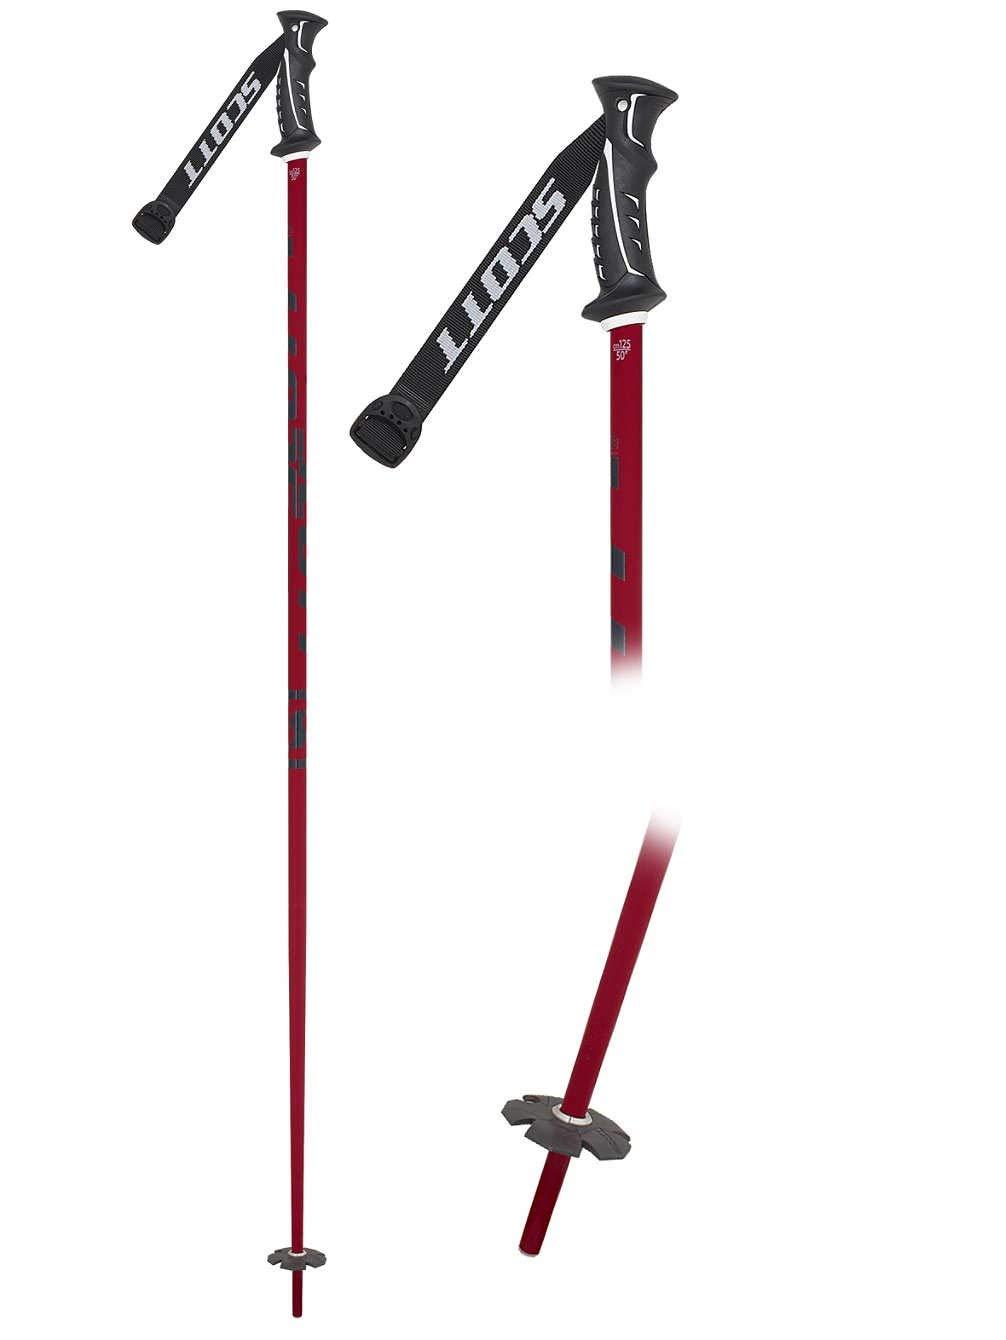 Scott Herren Skistock Decree 135cm 2018 SkistöCke B076GCYT9Q Stcke Einfach